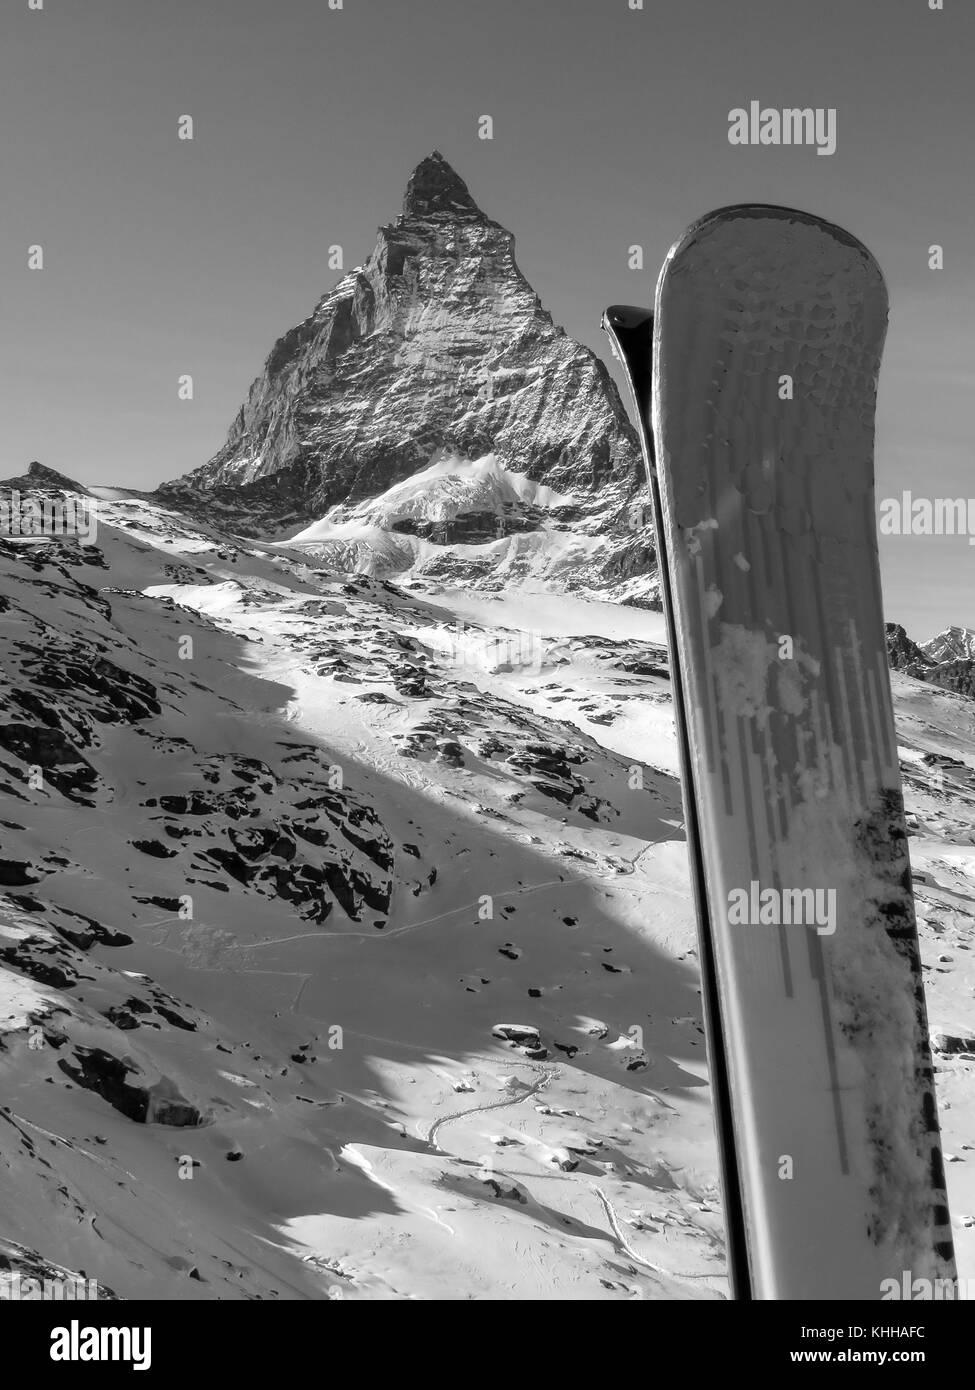 Matterhorn Mountain Peak Zermatt Glacier Ski Resort in Switzerland Swiss Alps Mountains Snow Season Winter Travel - Stock Image